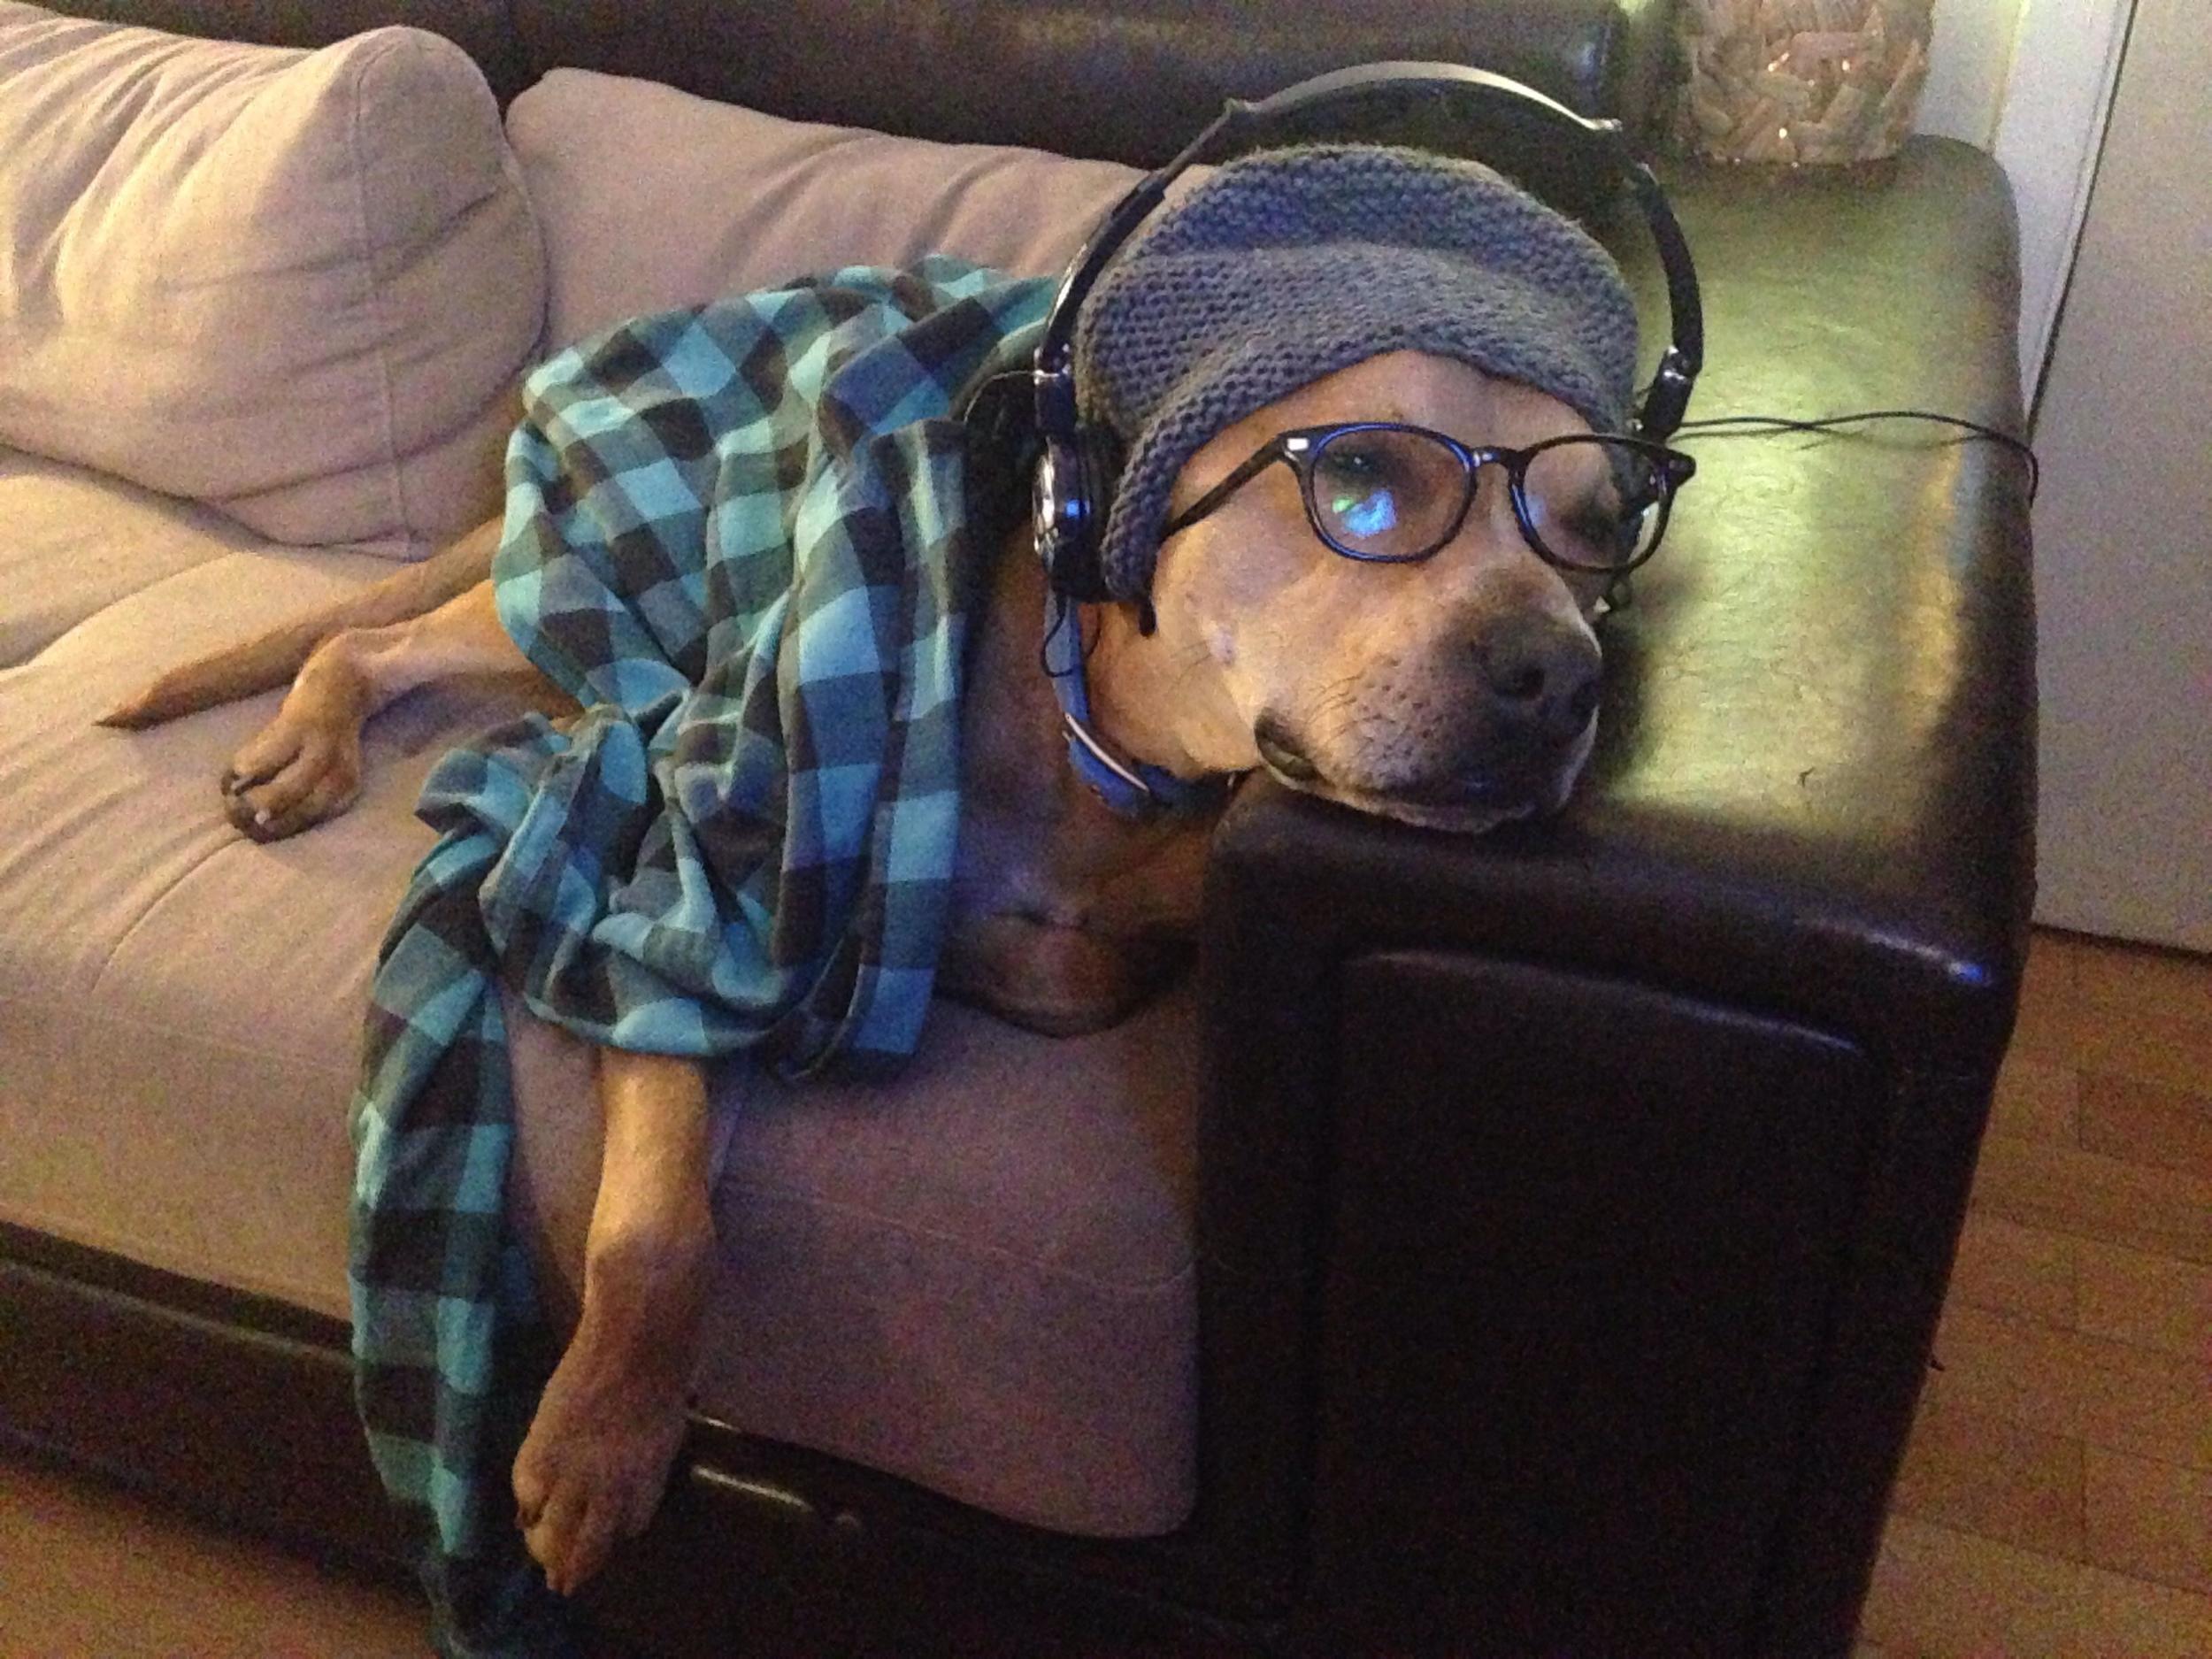 Dog lazing on a sofa listening to headphones